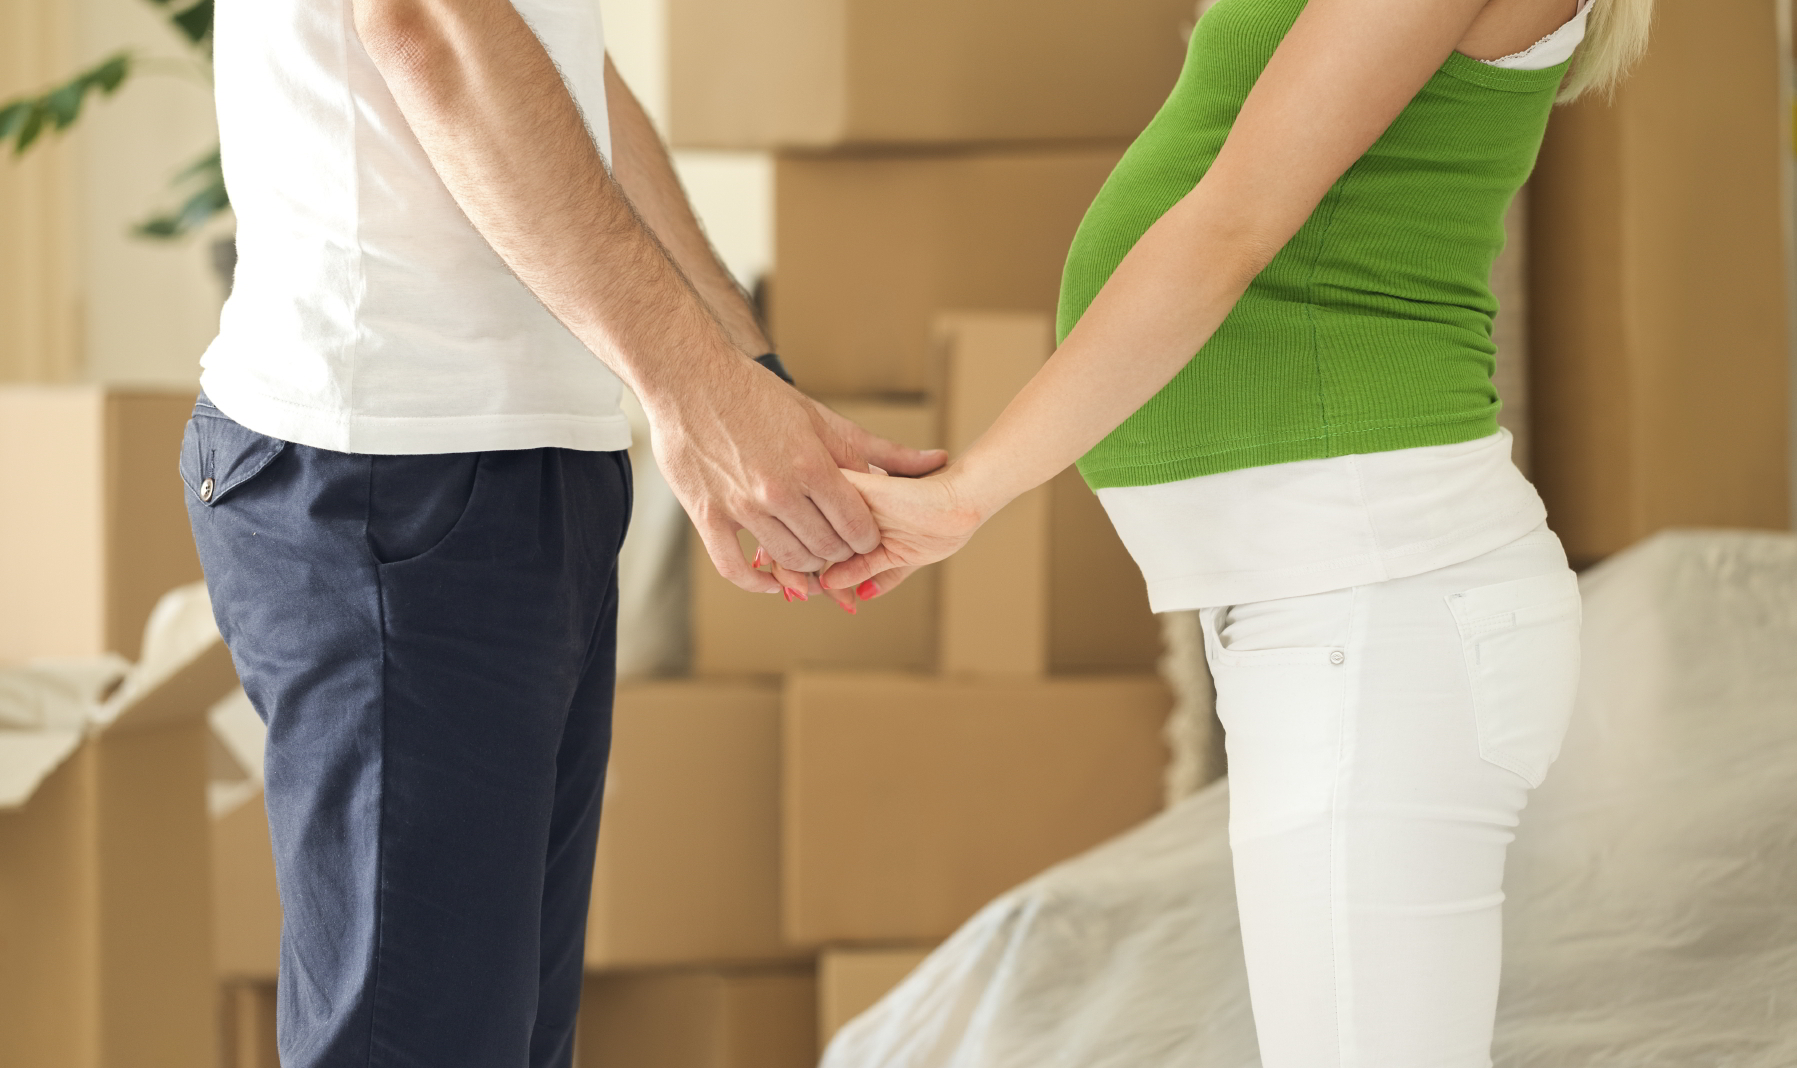 3. trimester - Flytning sidst i graviditeten